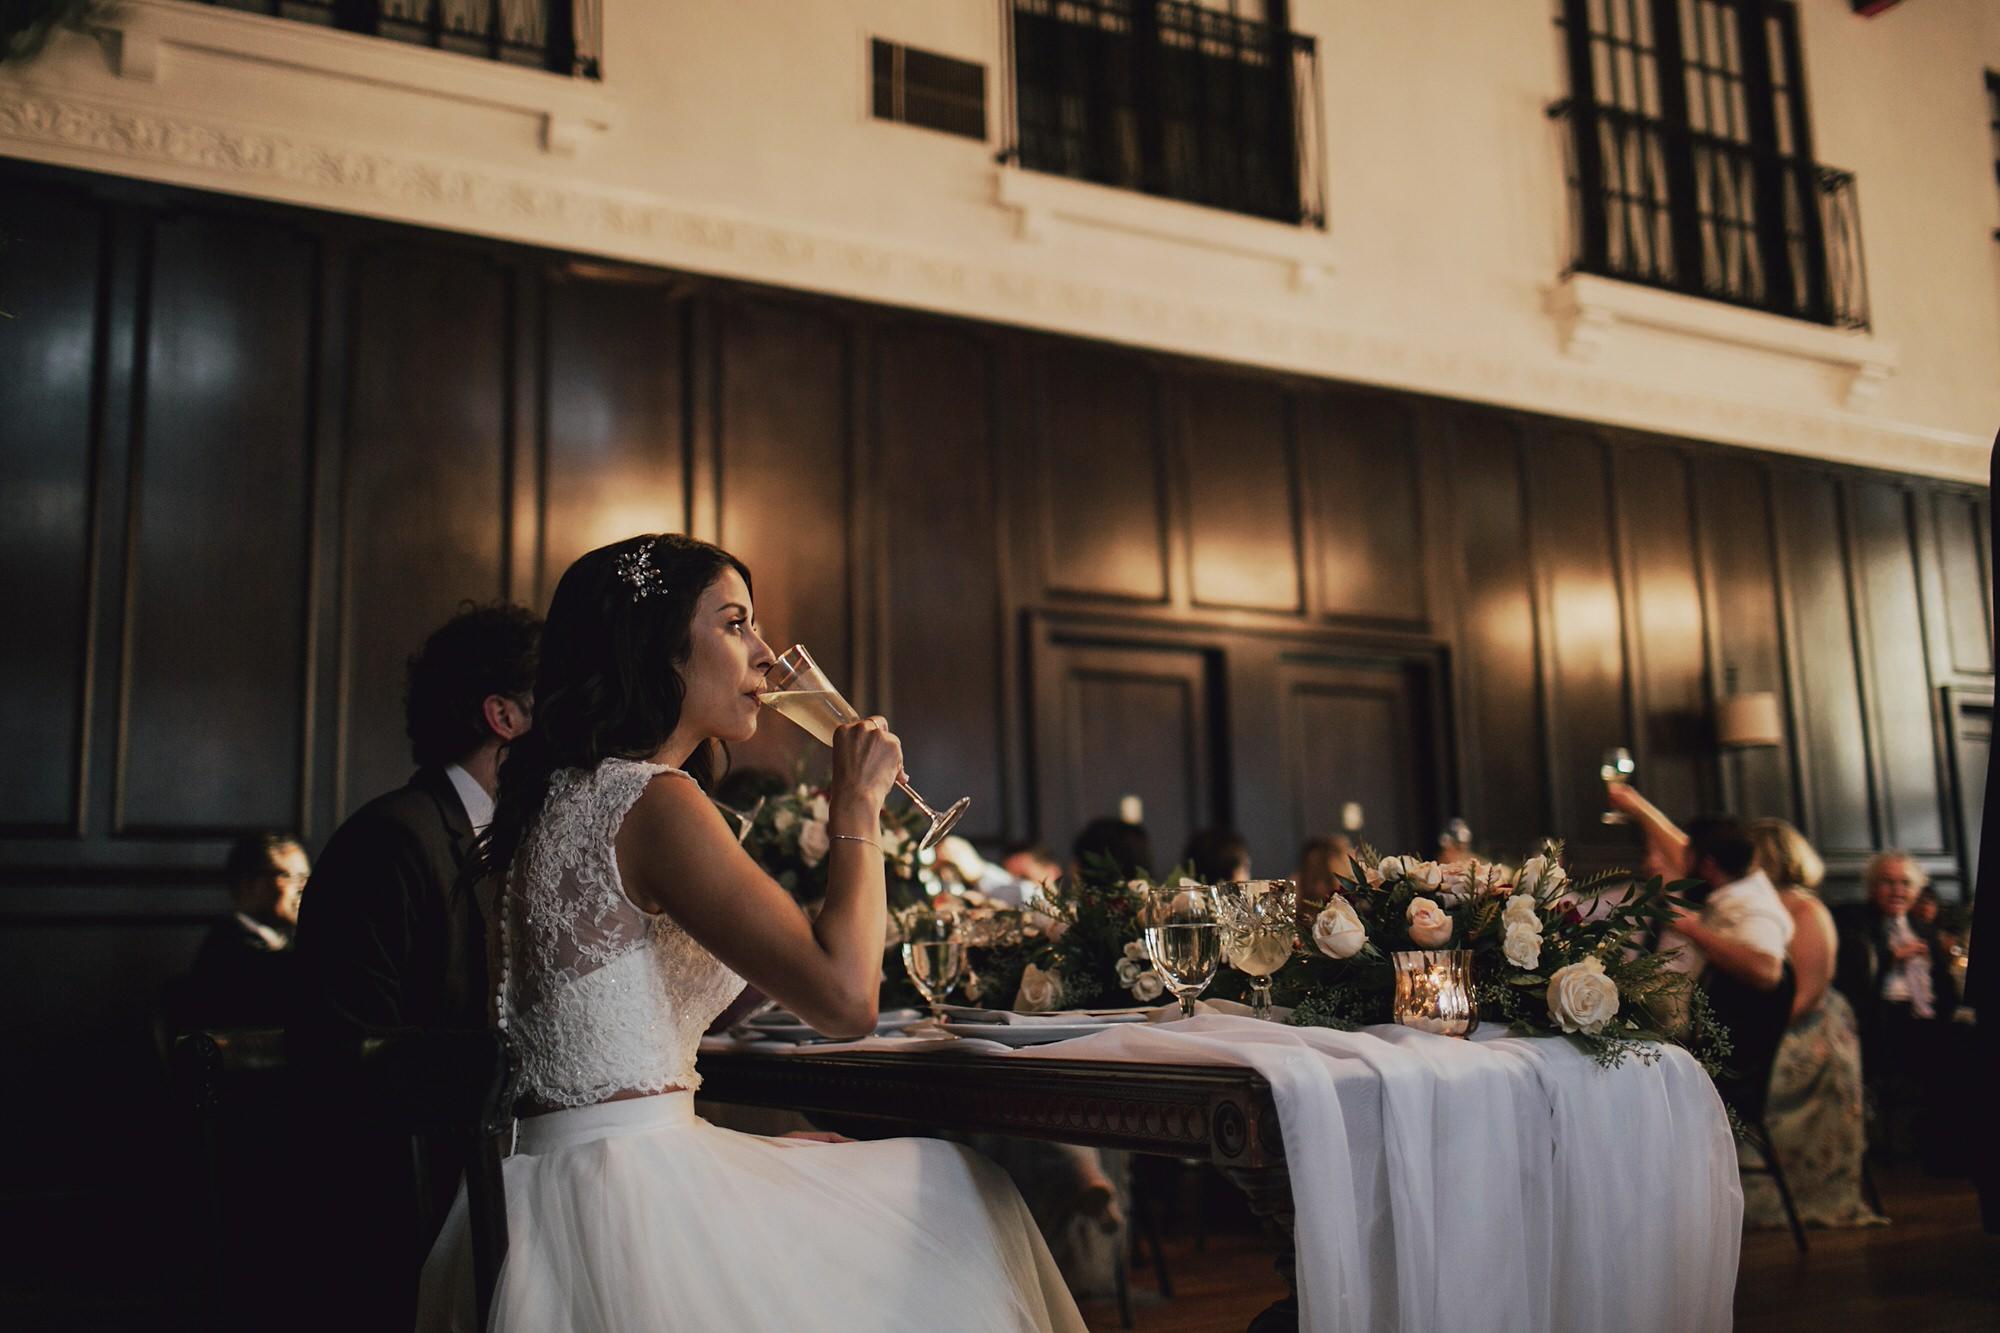 christine-ken-ebell-long-beach-wedding-107.jpg